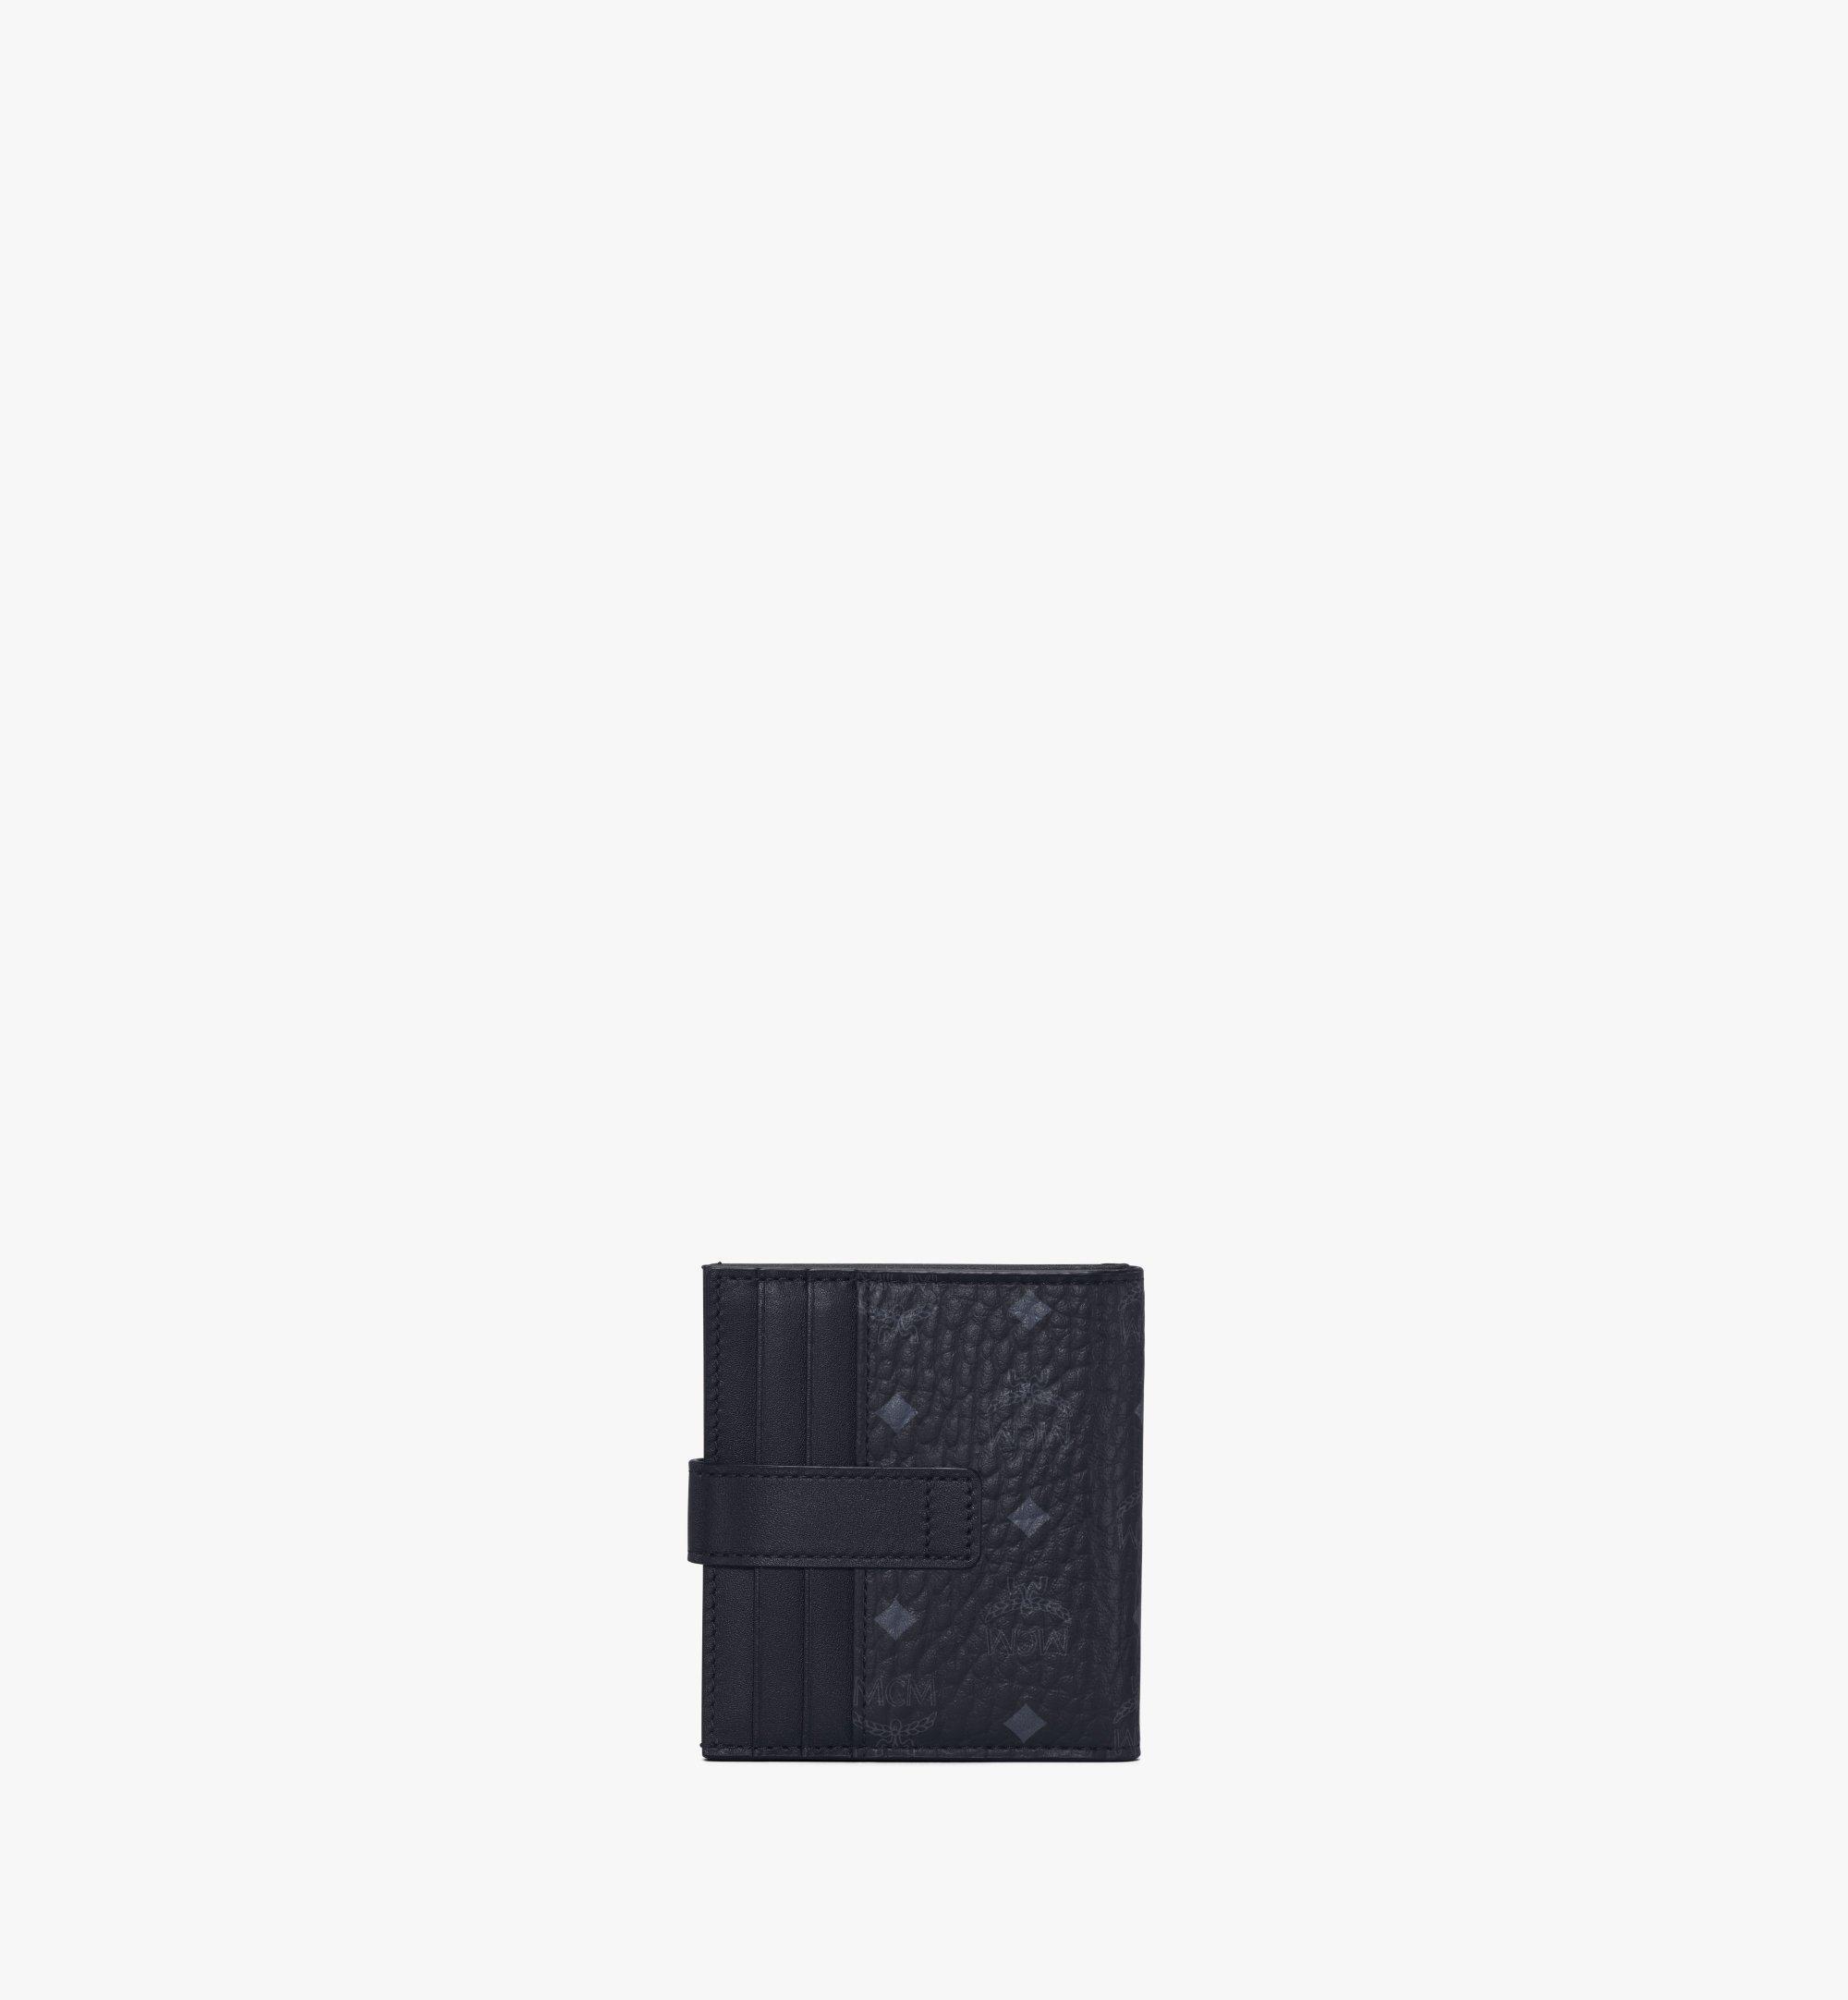 MCM Bifold Card Wallet in Visetos Original Black MXSAAVI05BK001 Alternate View 2